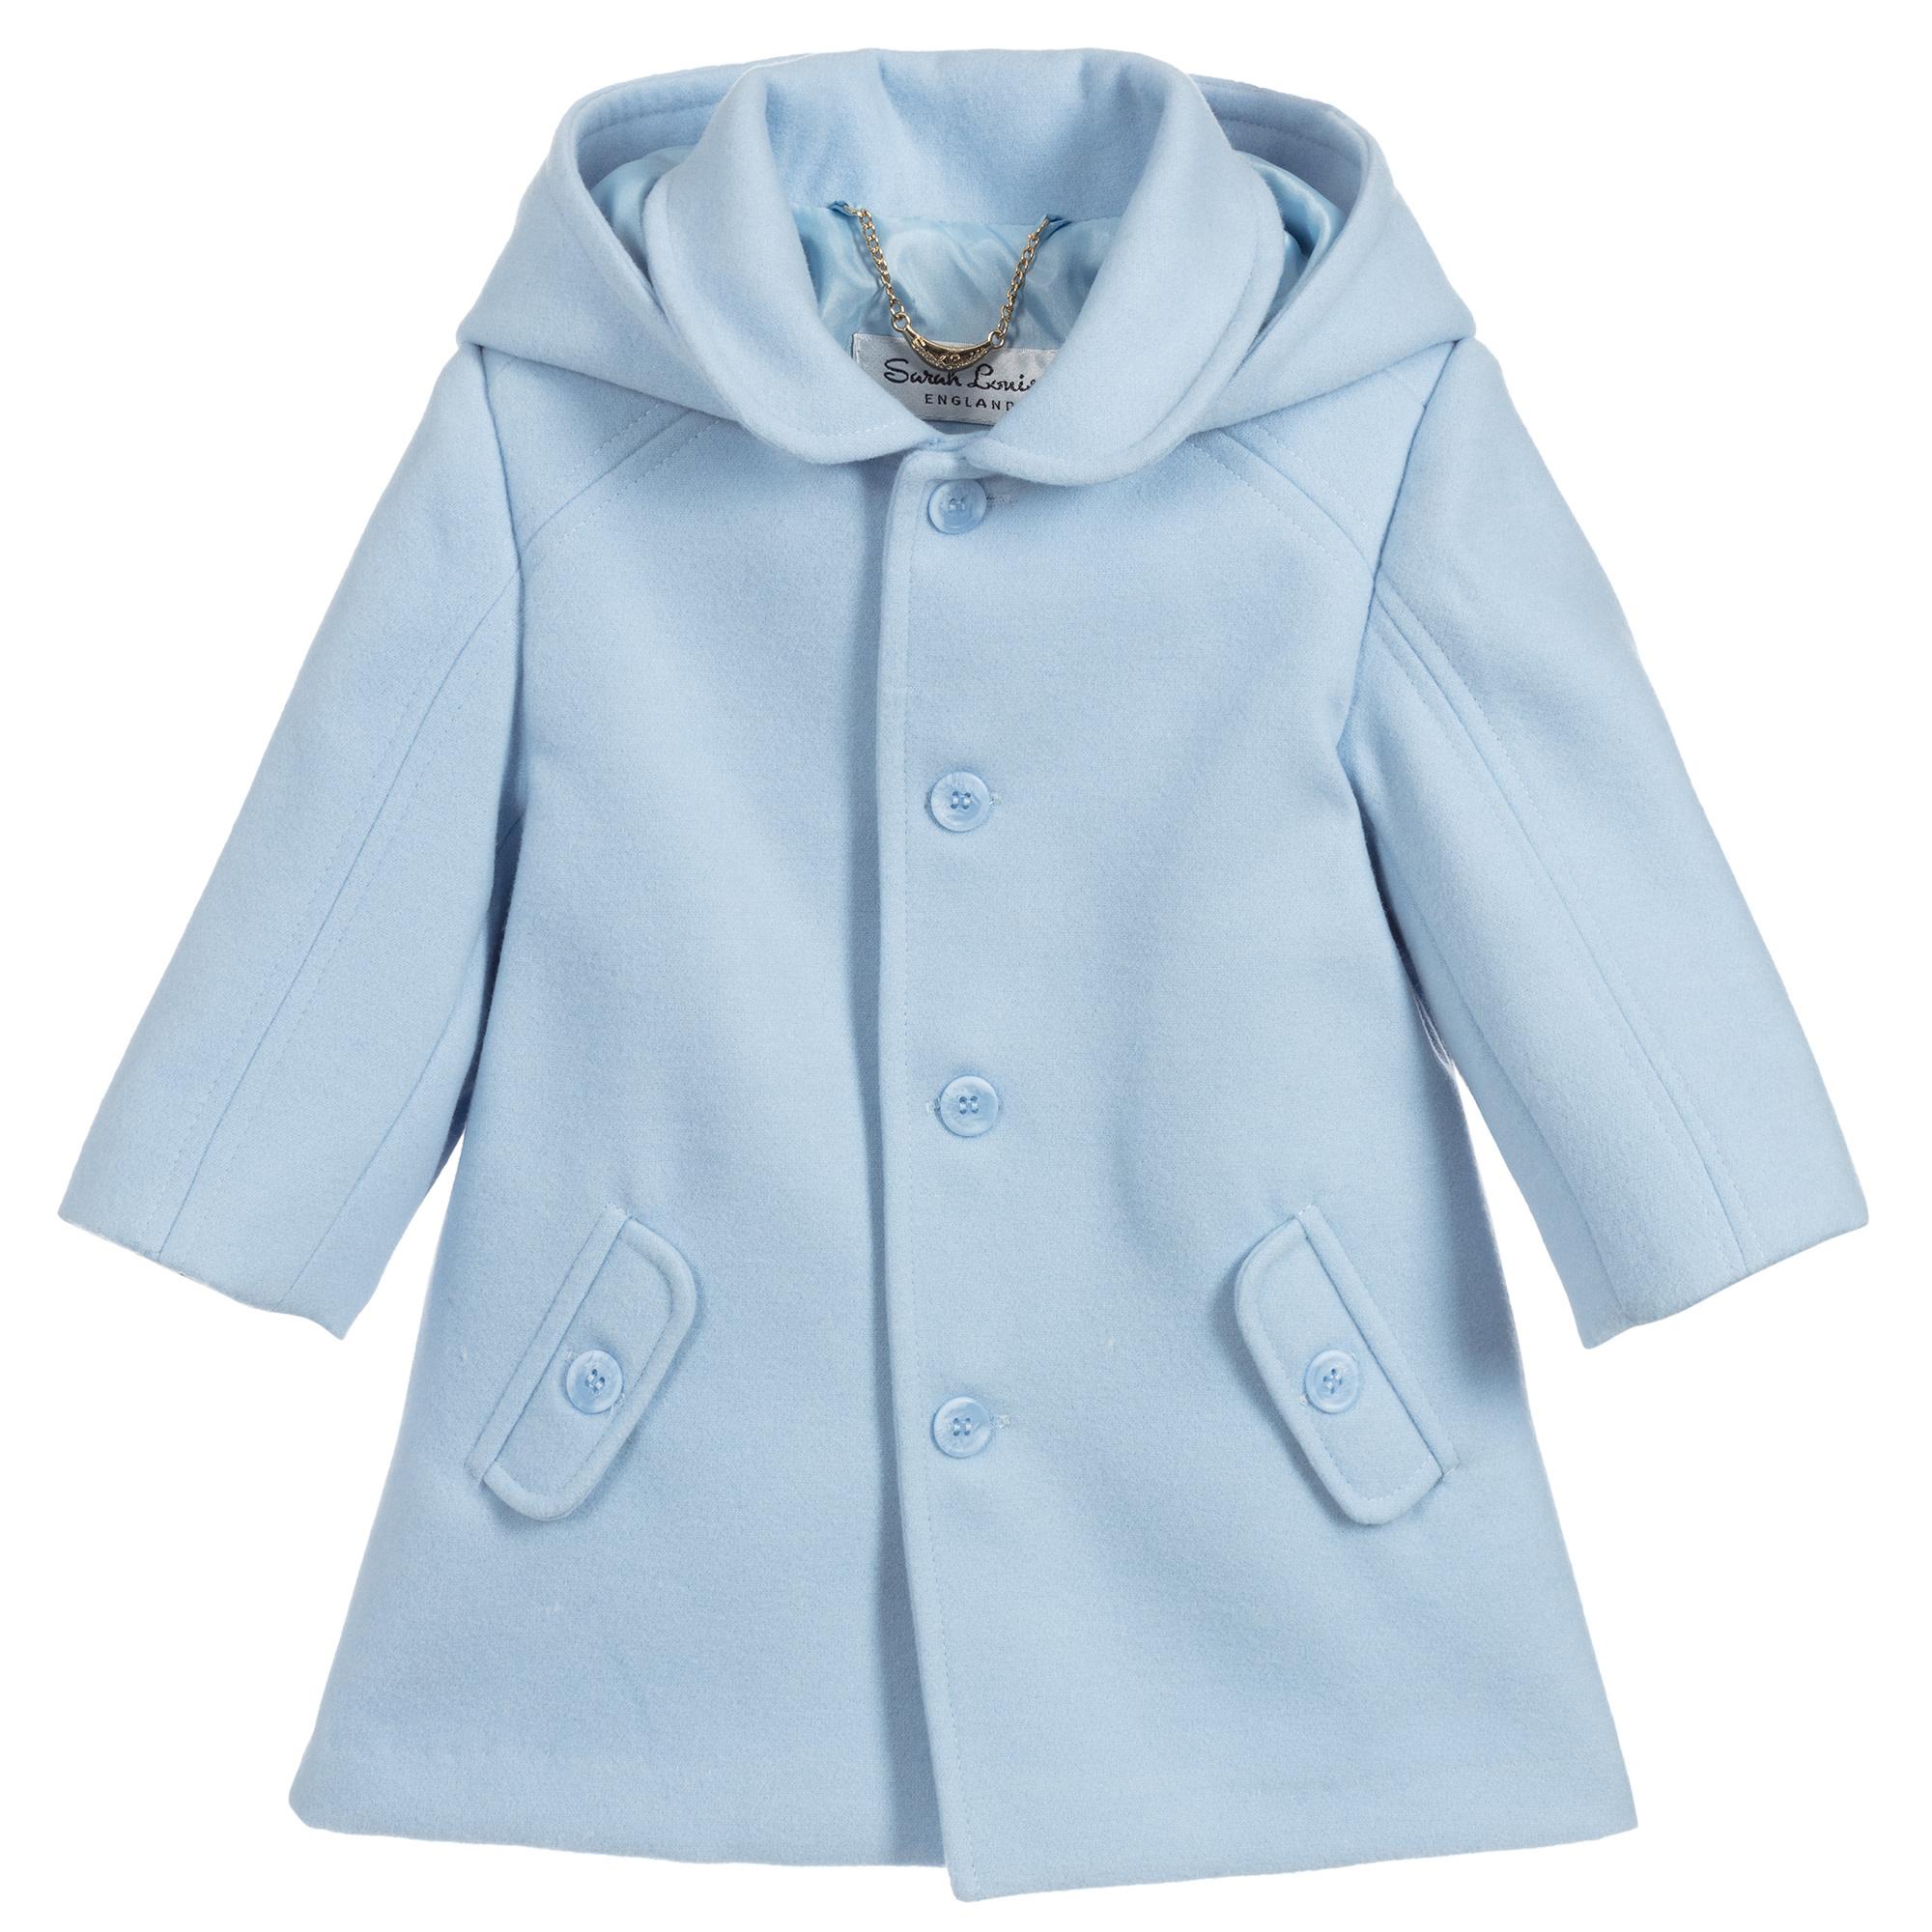 Sarah Louise Sarah Louise AW19 Boys Blue Coat 011777 Age 2 Years